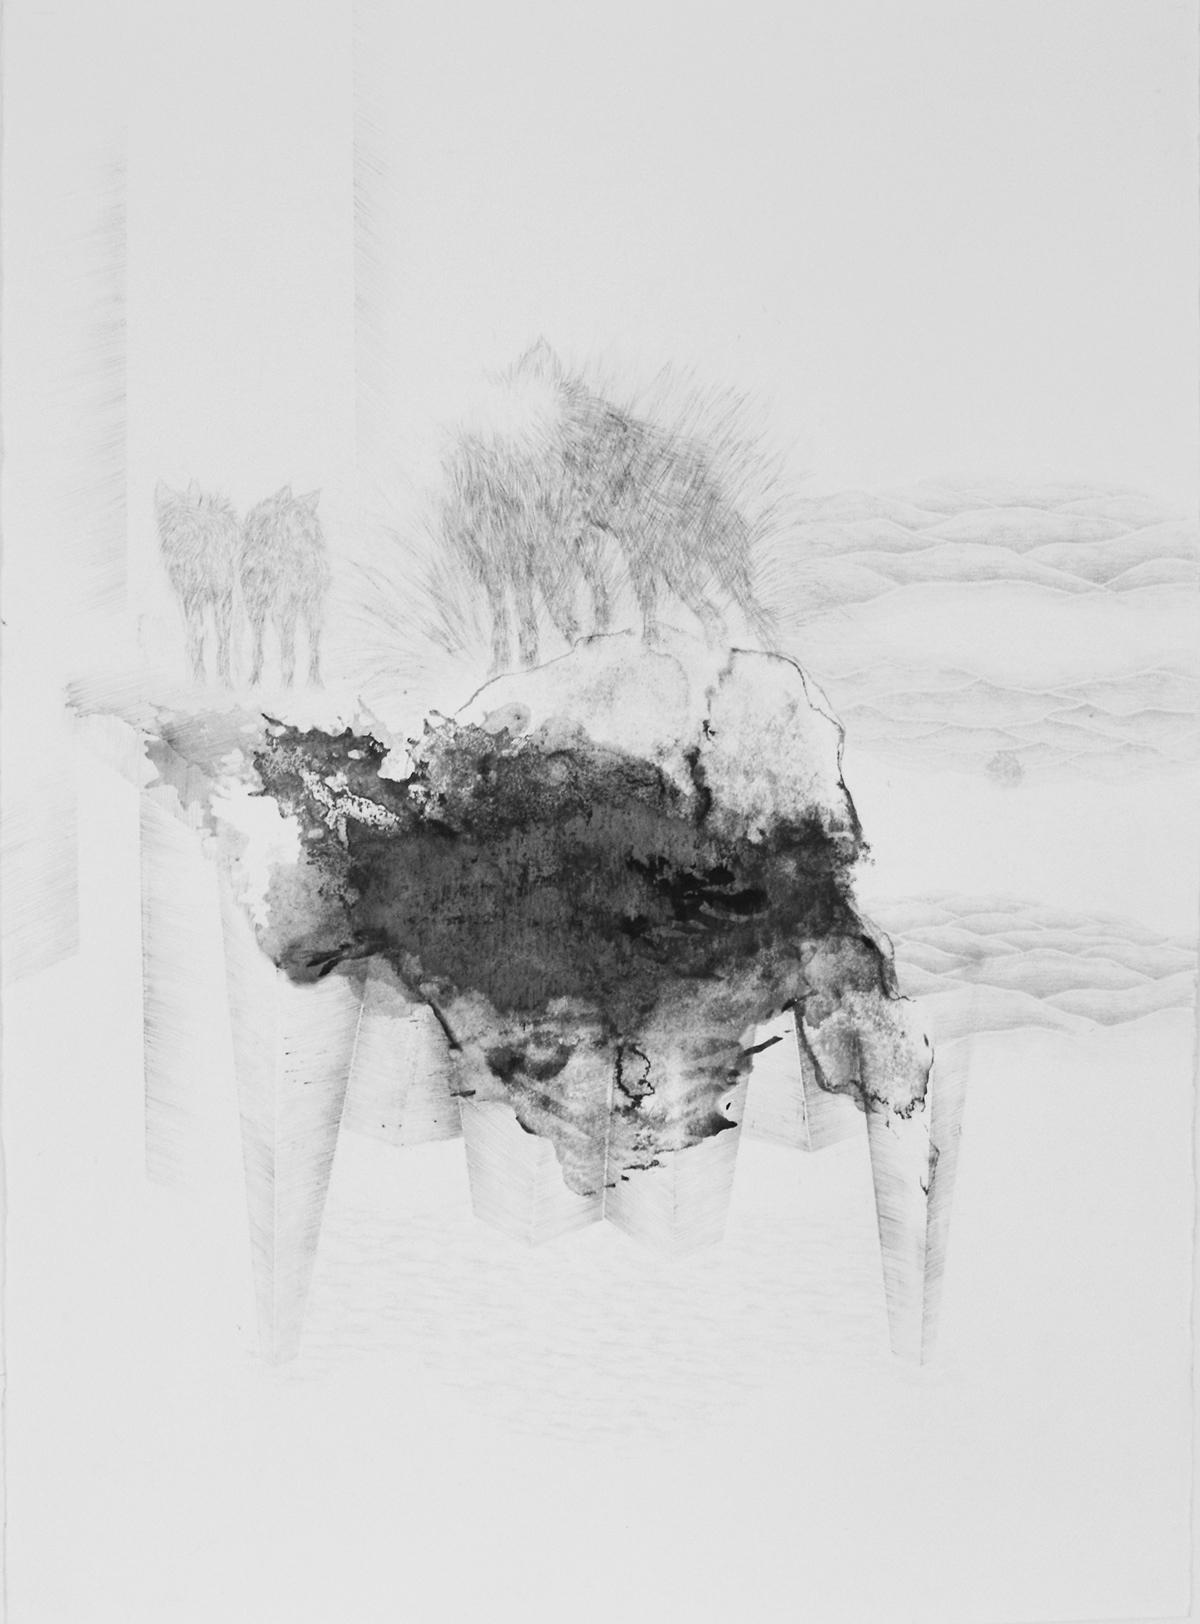 <i>Les instincts</i>, 2015, graphite et gouache, 80x60cm